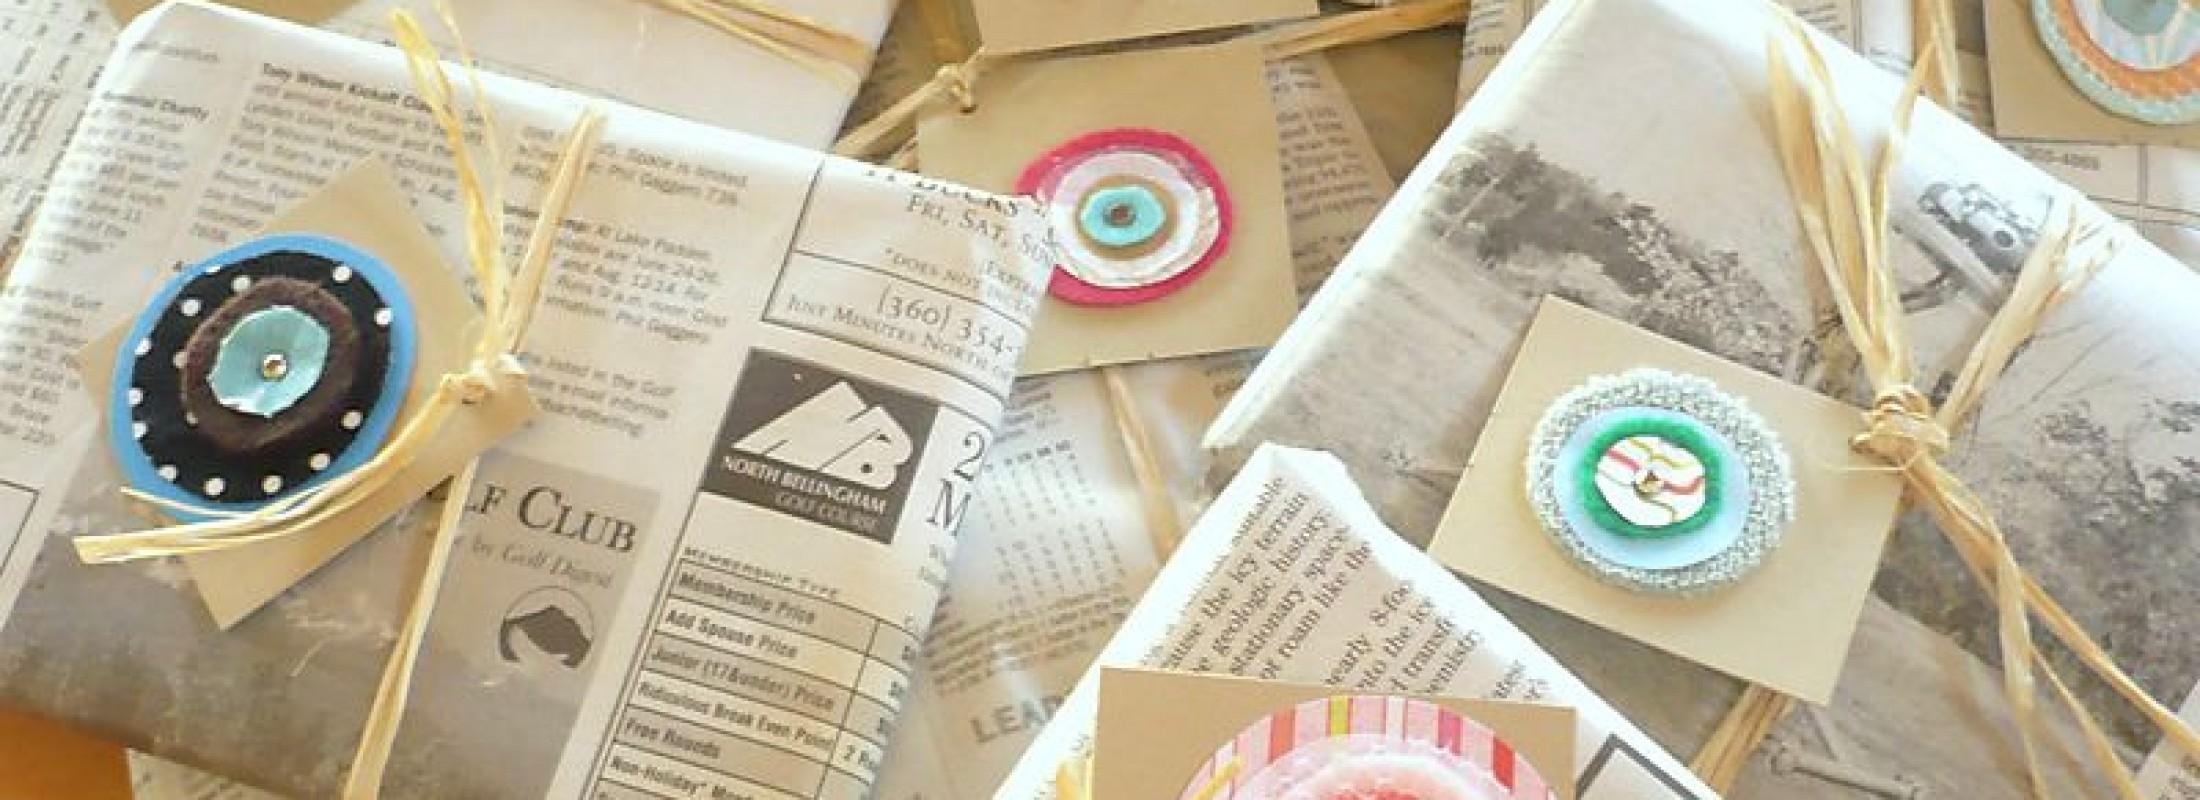 Distinctive Newspapers Used As Gift Tags Turn Newspapers Into Gift Packaging Gift Packaging Videos Gift Packaging Mooresboro Nc gifts Creative Gift Packaging